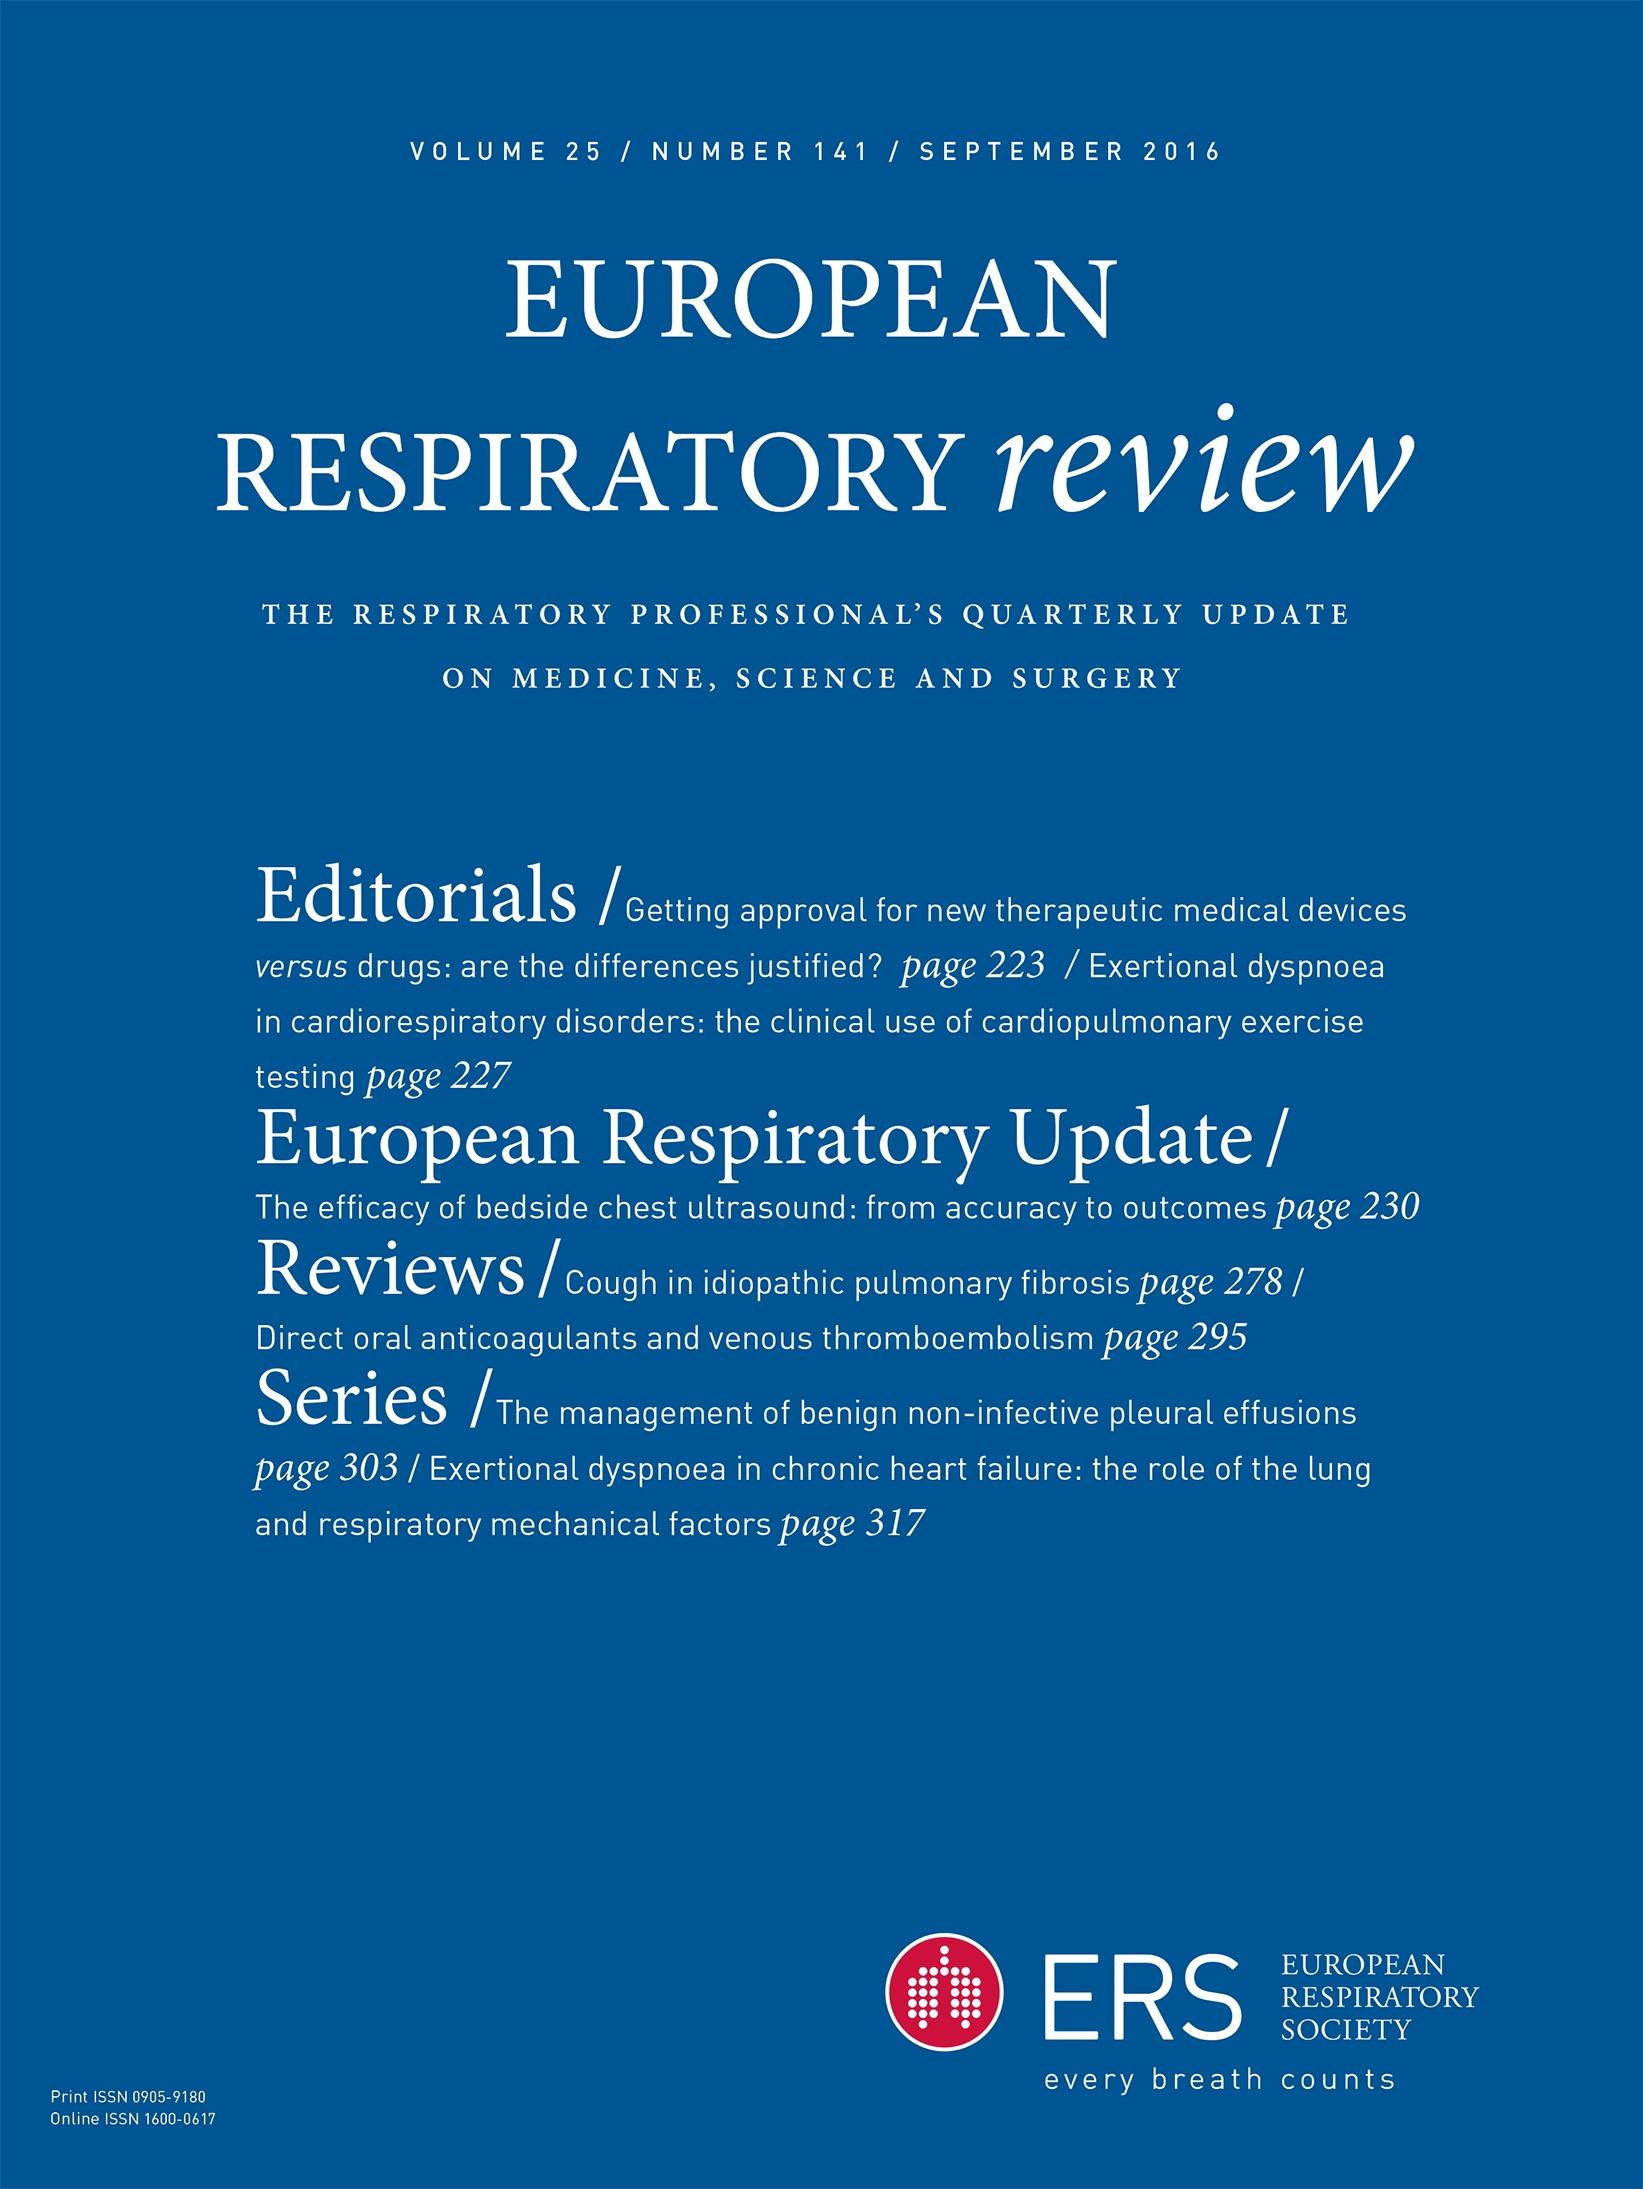 Cough in idiopathic pulmonary fibrosis | European Respiratory Society